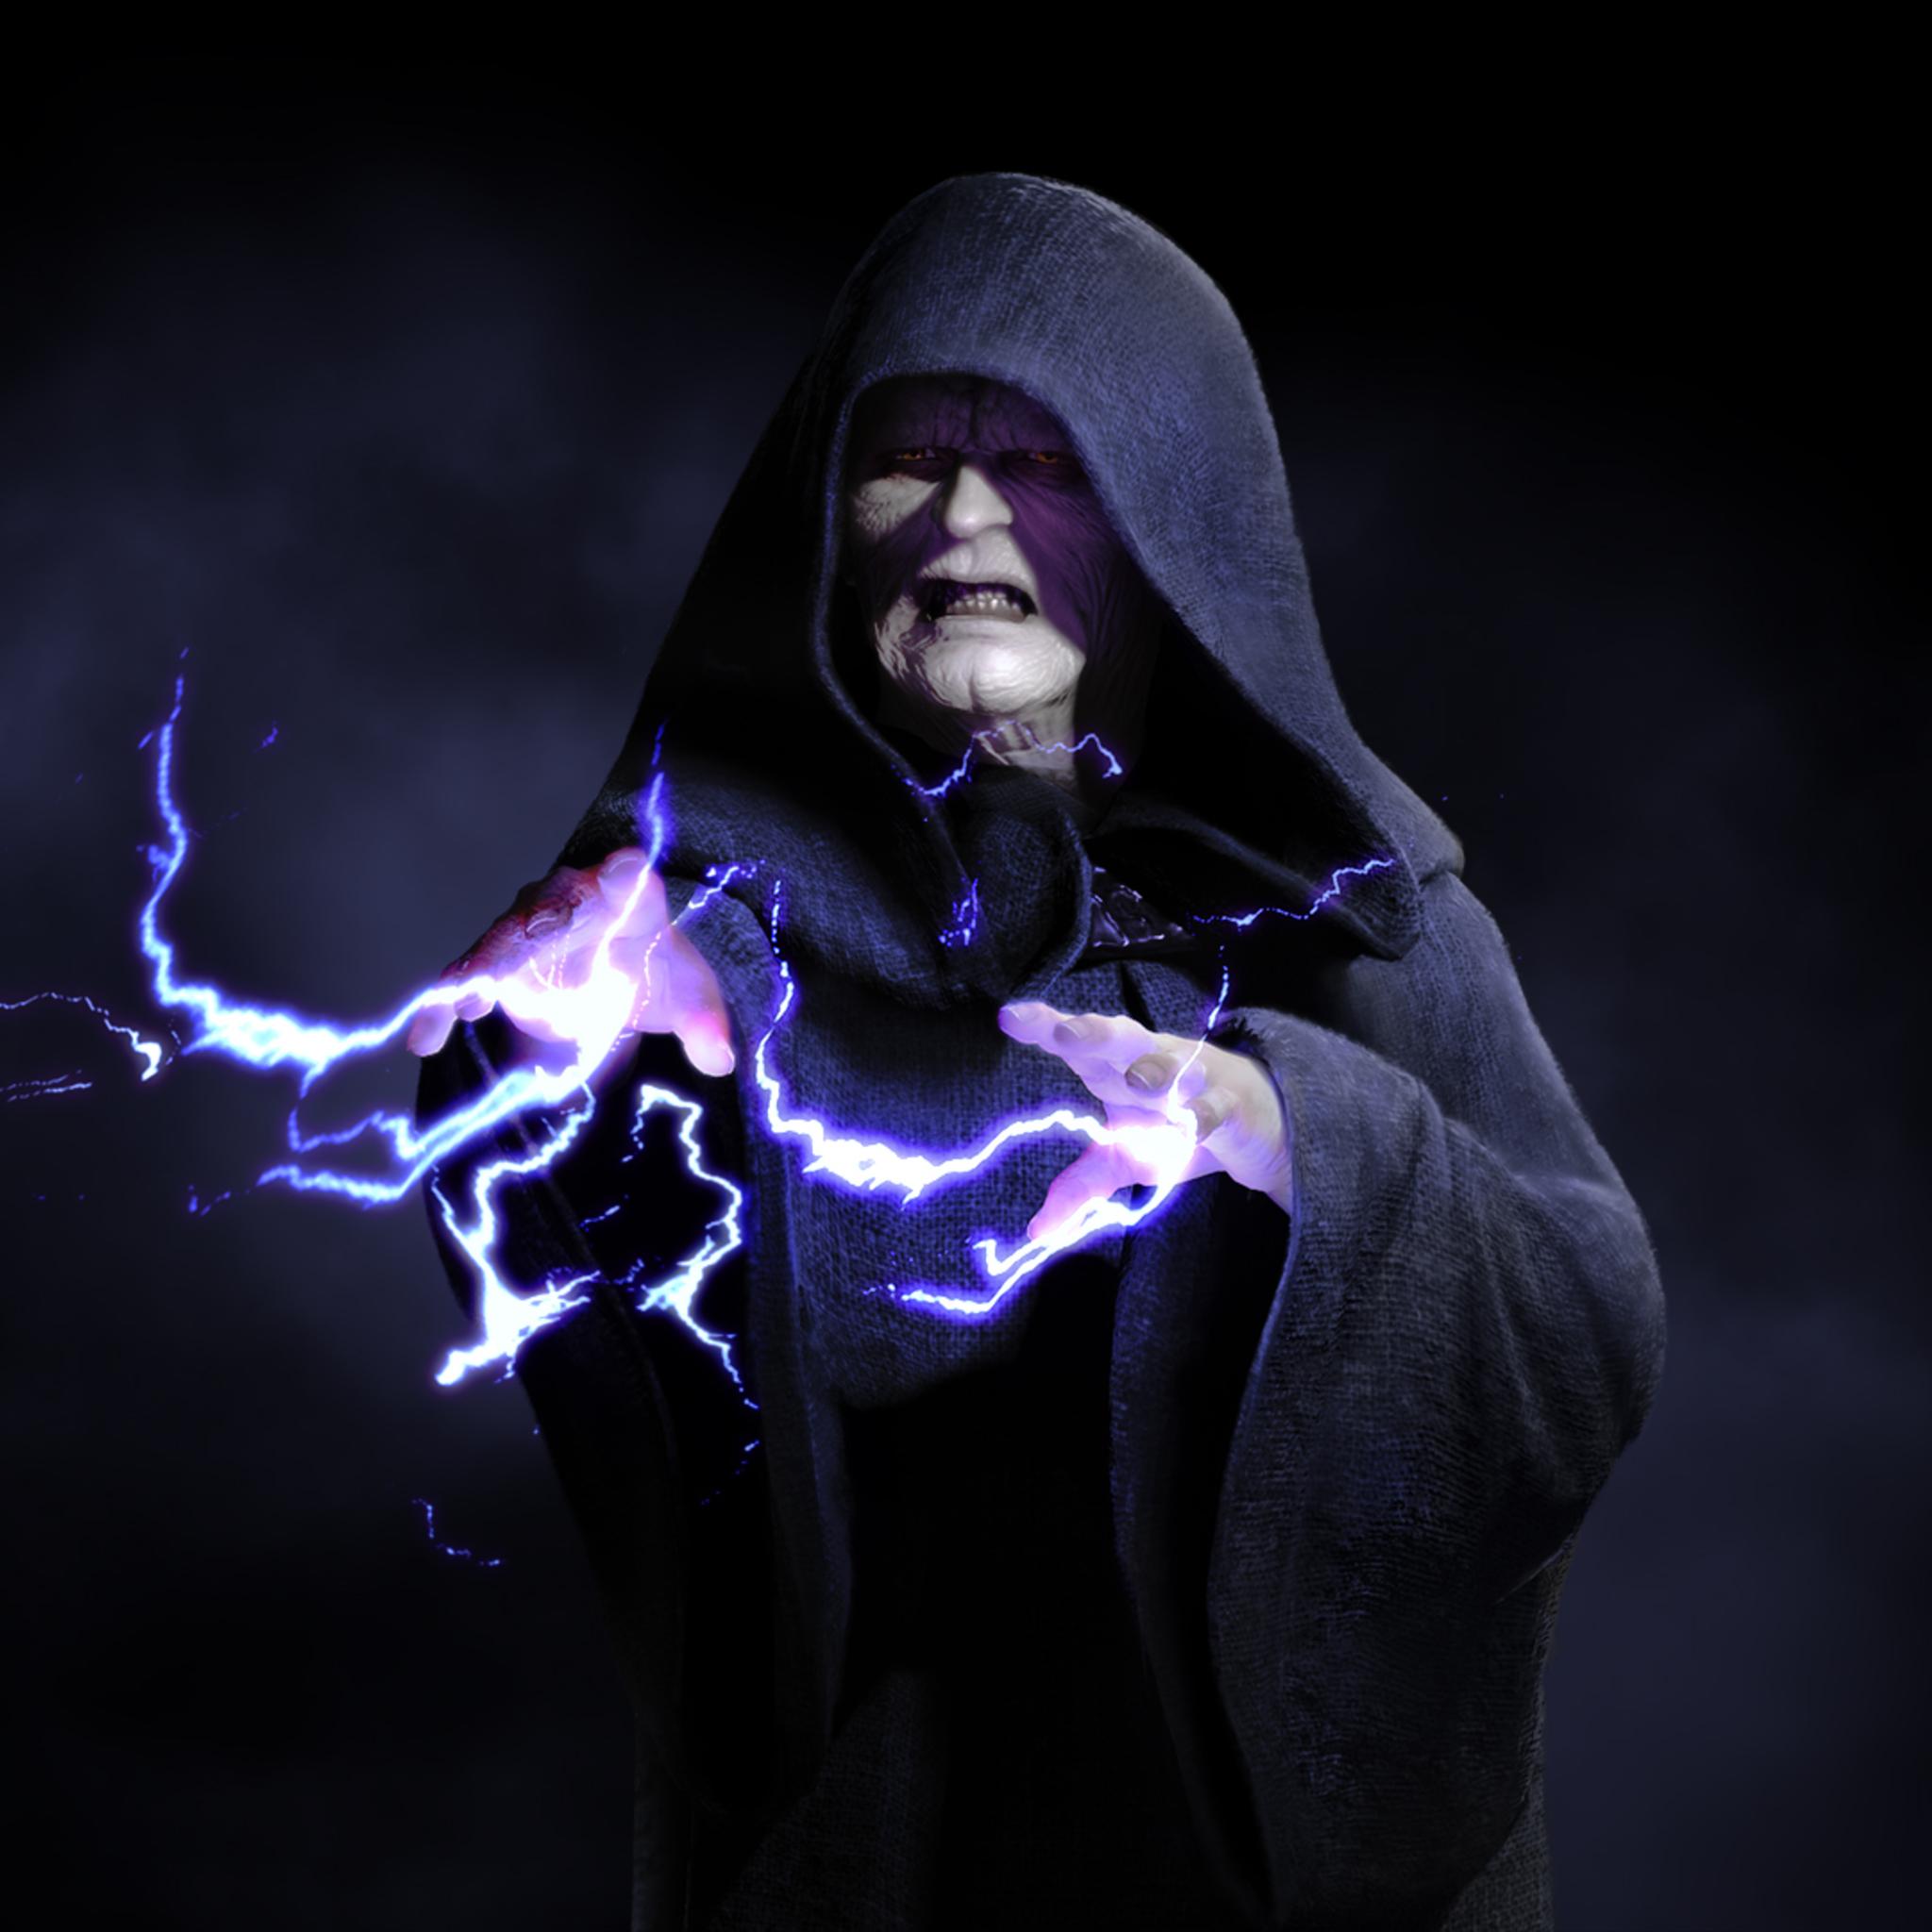 2048x2048 Emperor Palpatine Star Wars Battlefront II Ipad